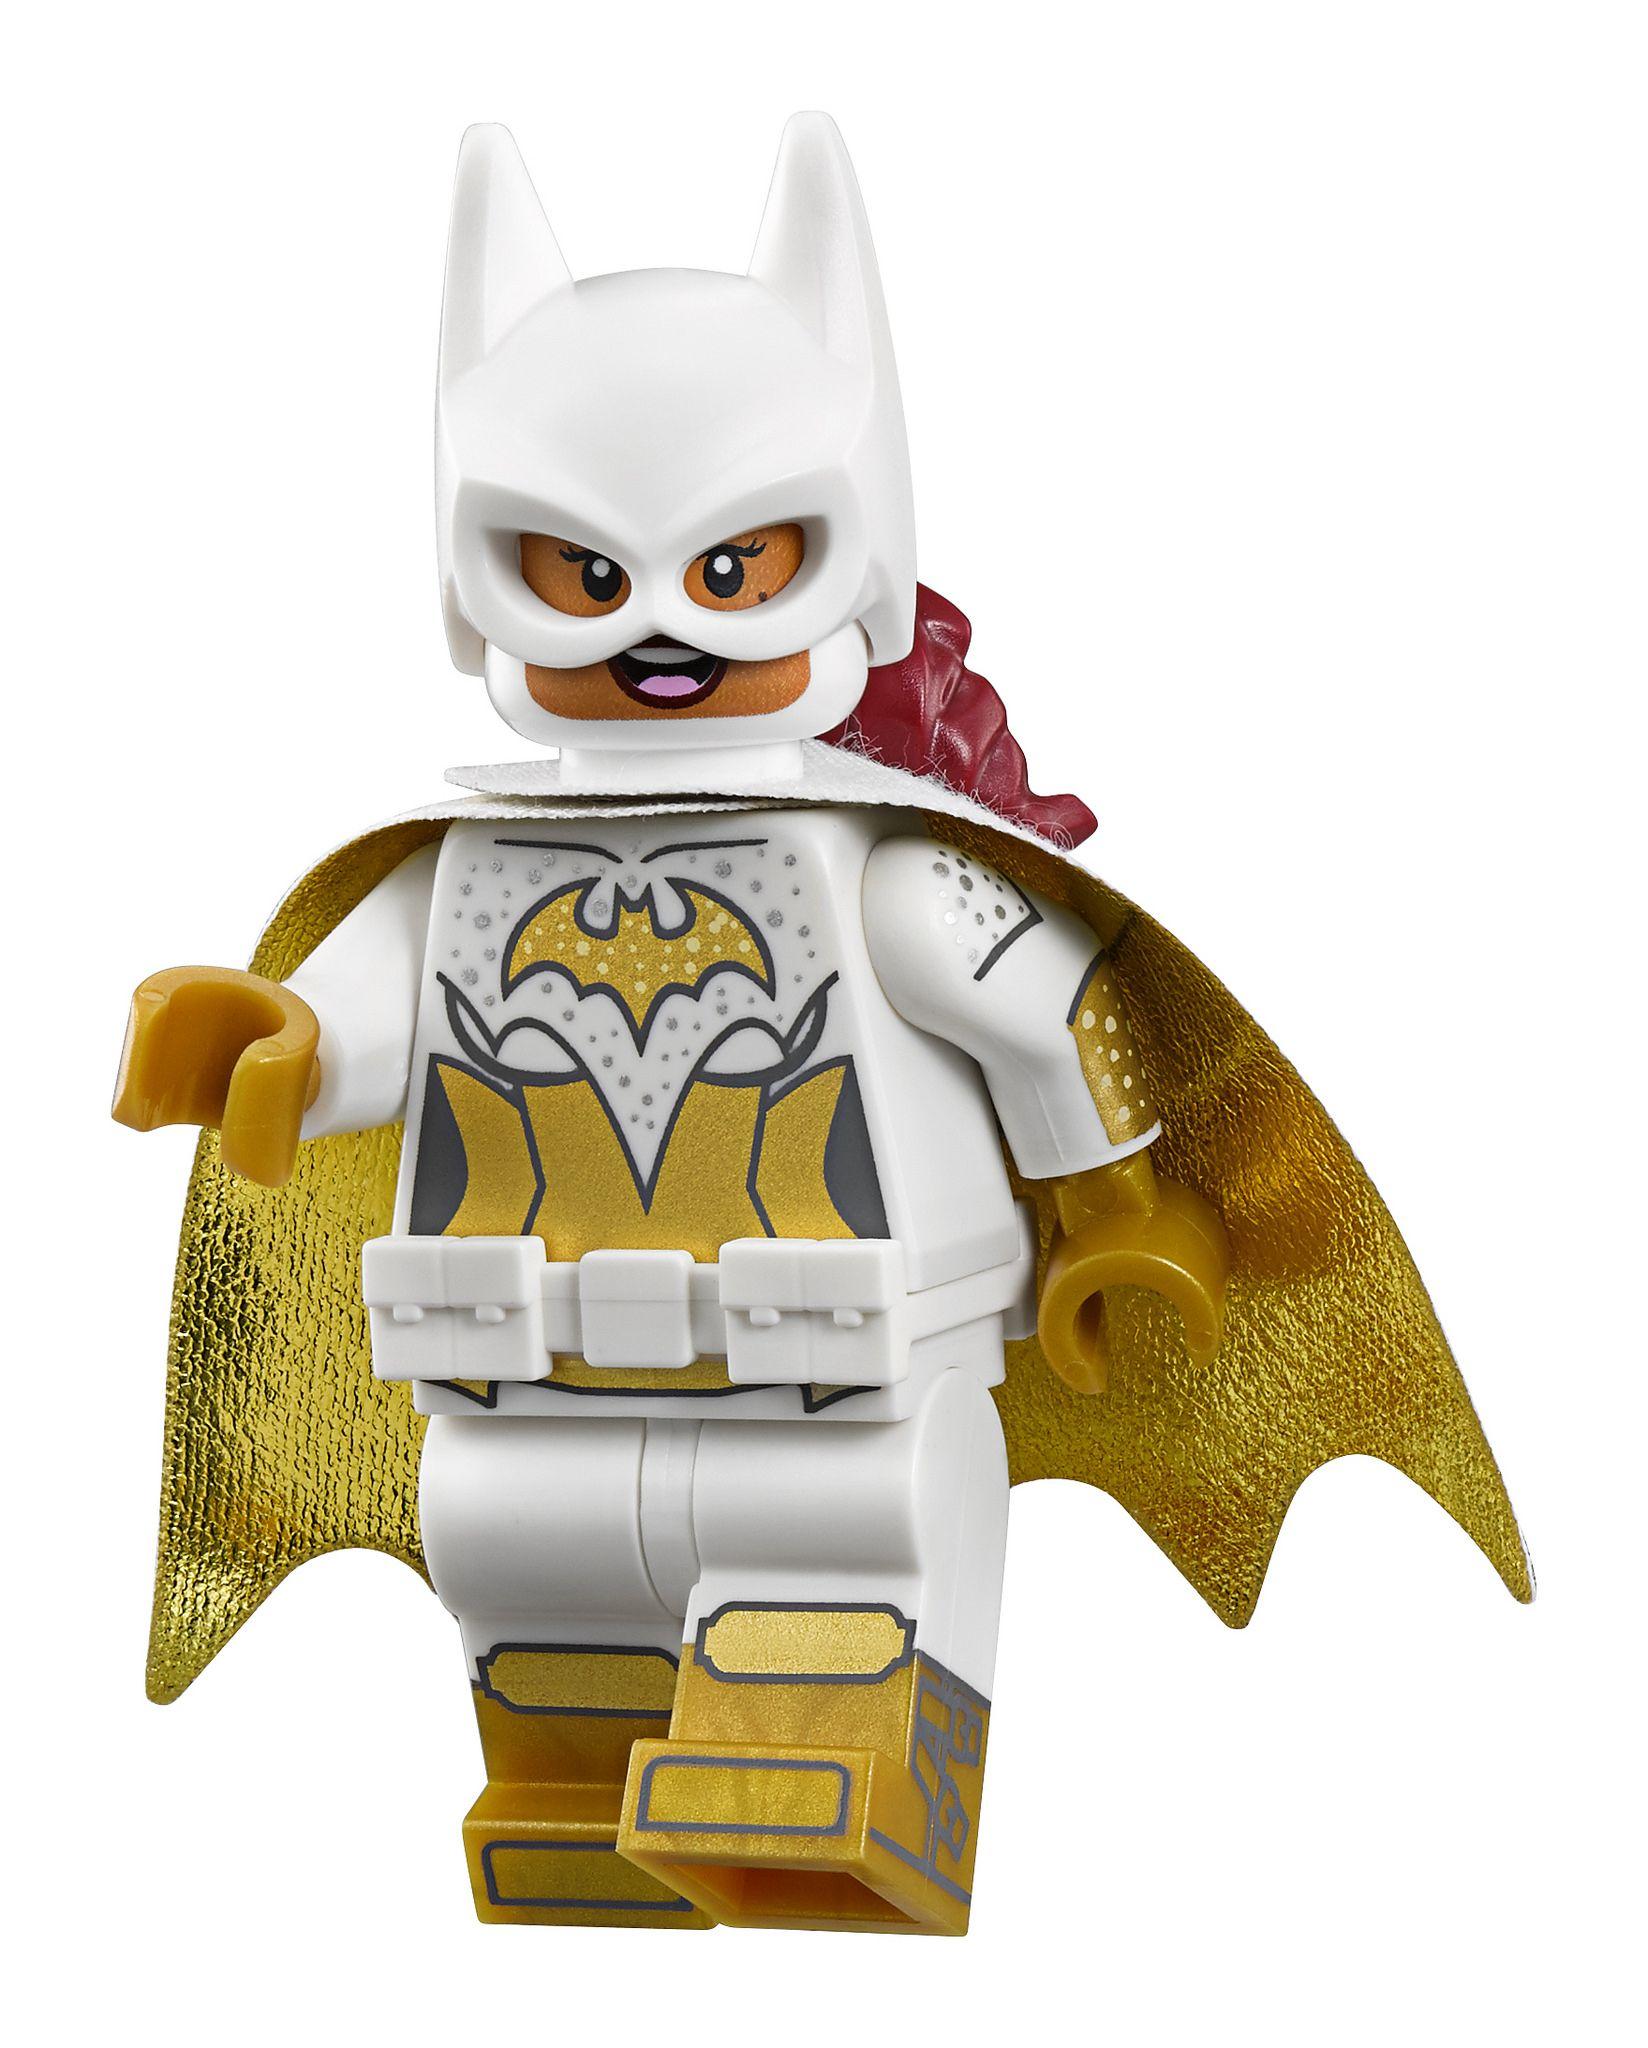 Lego Disco Batgirl 70922 Batman Movie Super Heroes Minifigure